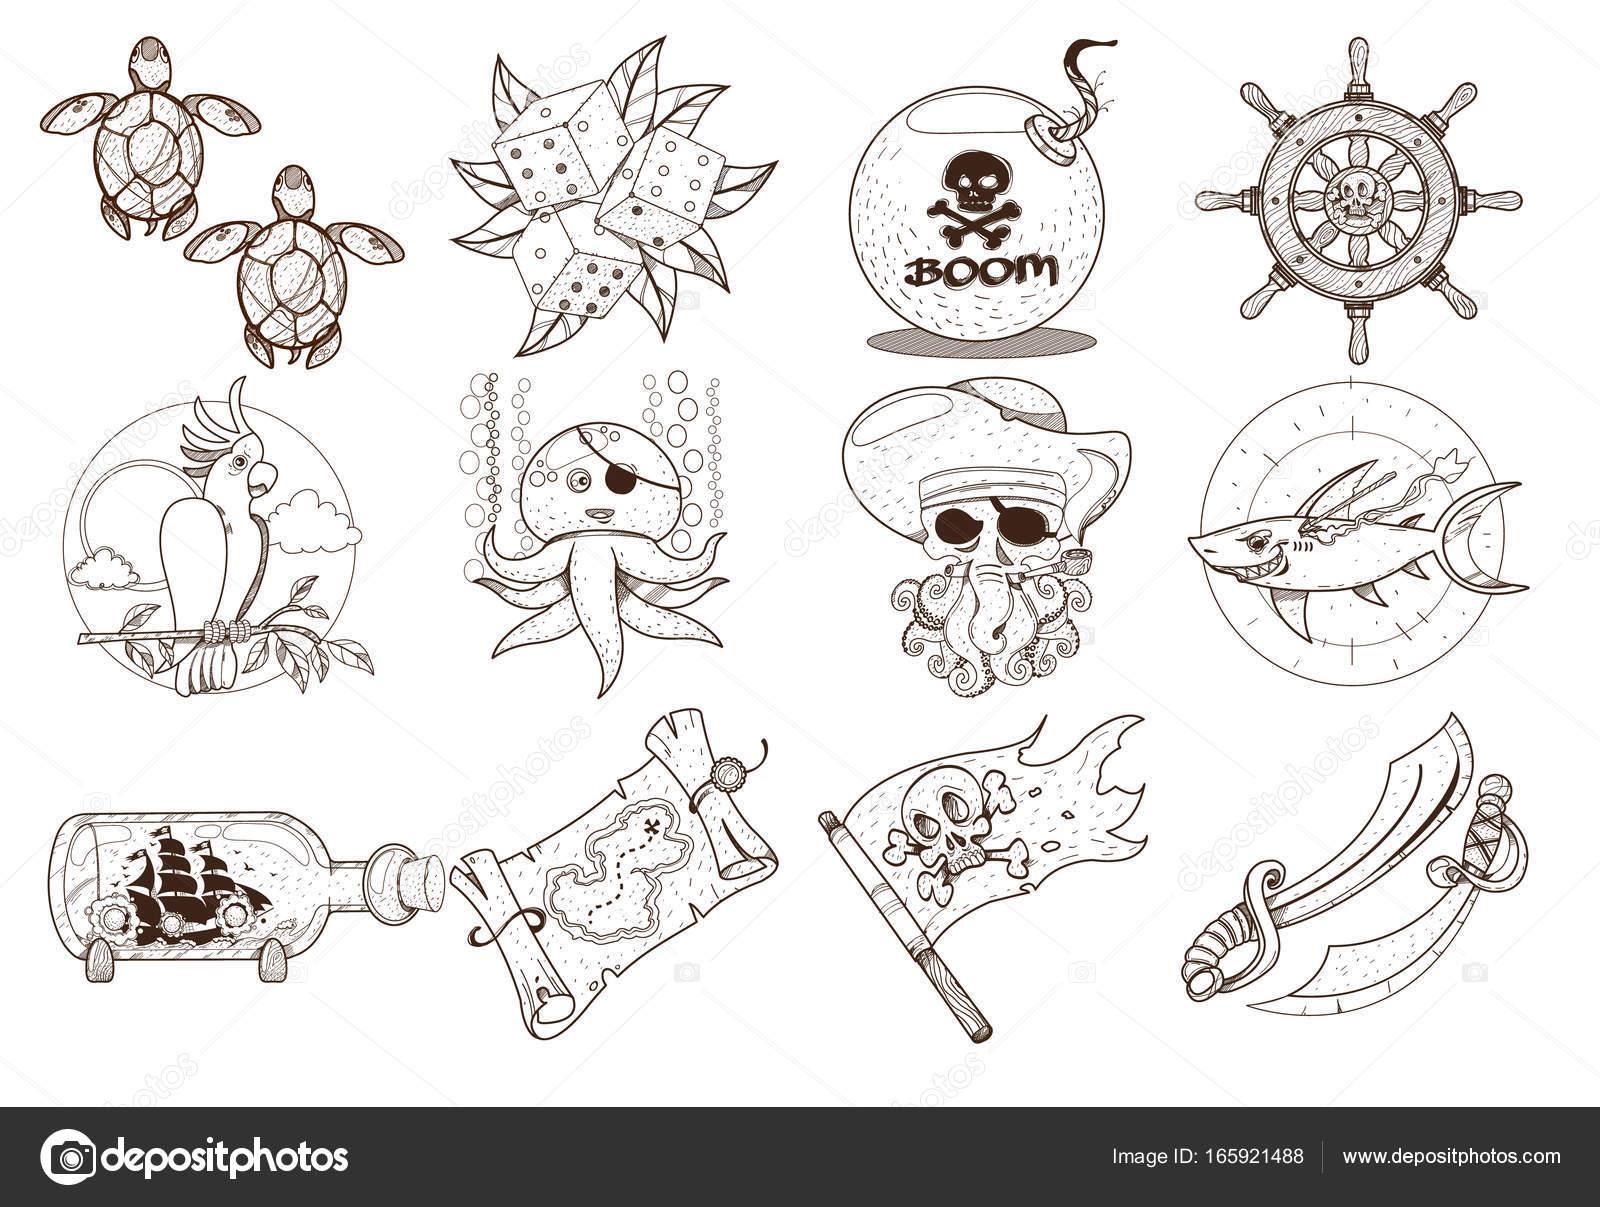 Kleurplaten Thema Dieren.Kleurplaten Rond Het Thema Piraten Stockvector C Filkusto 165921488